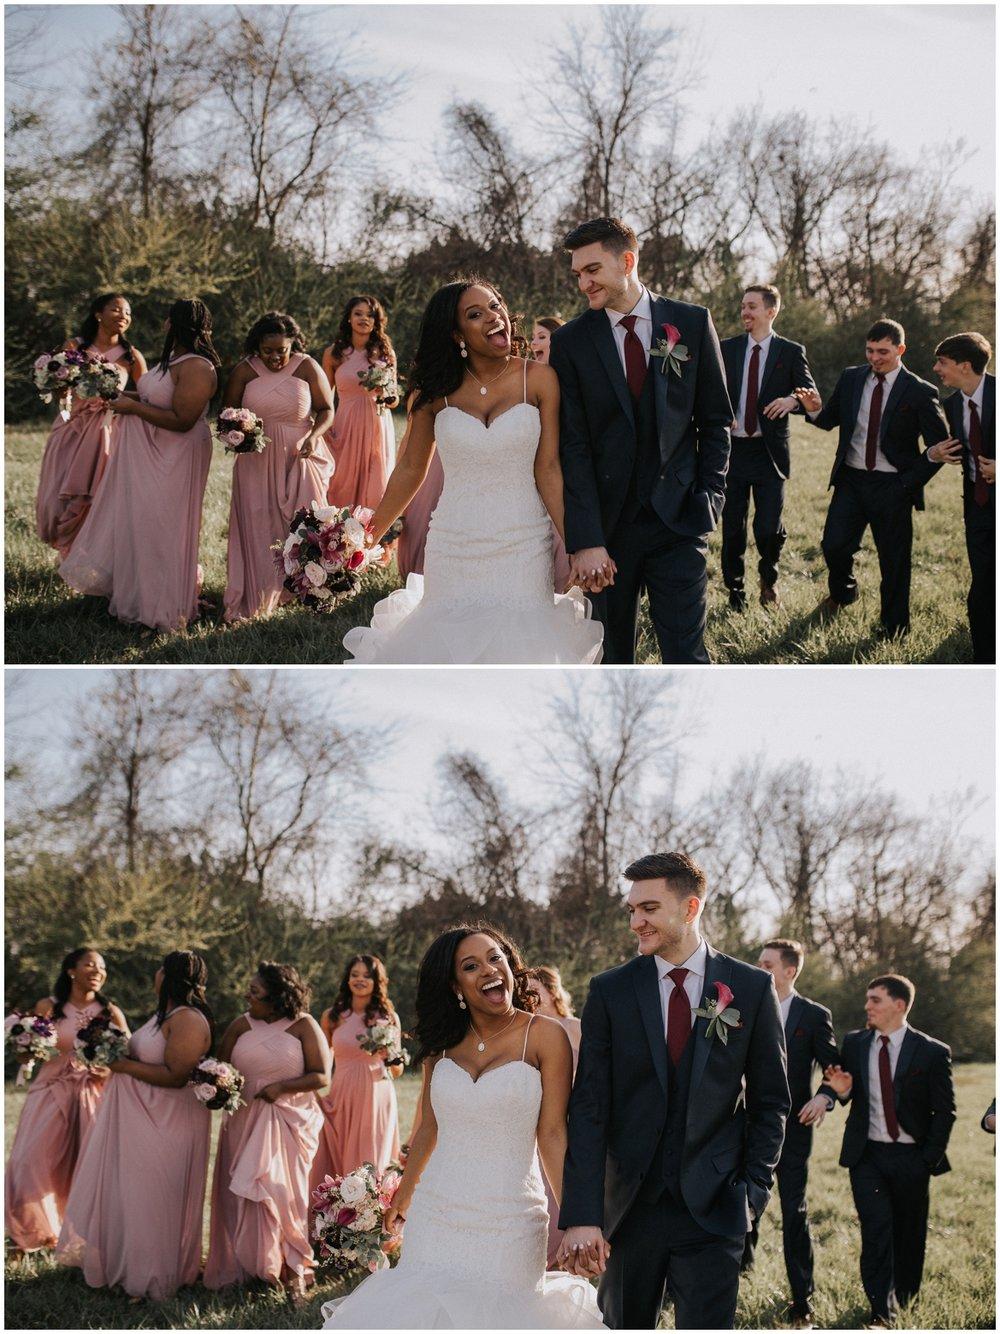 shipley_memphis_wedding_photographer_14.jpg